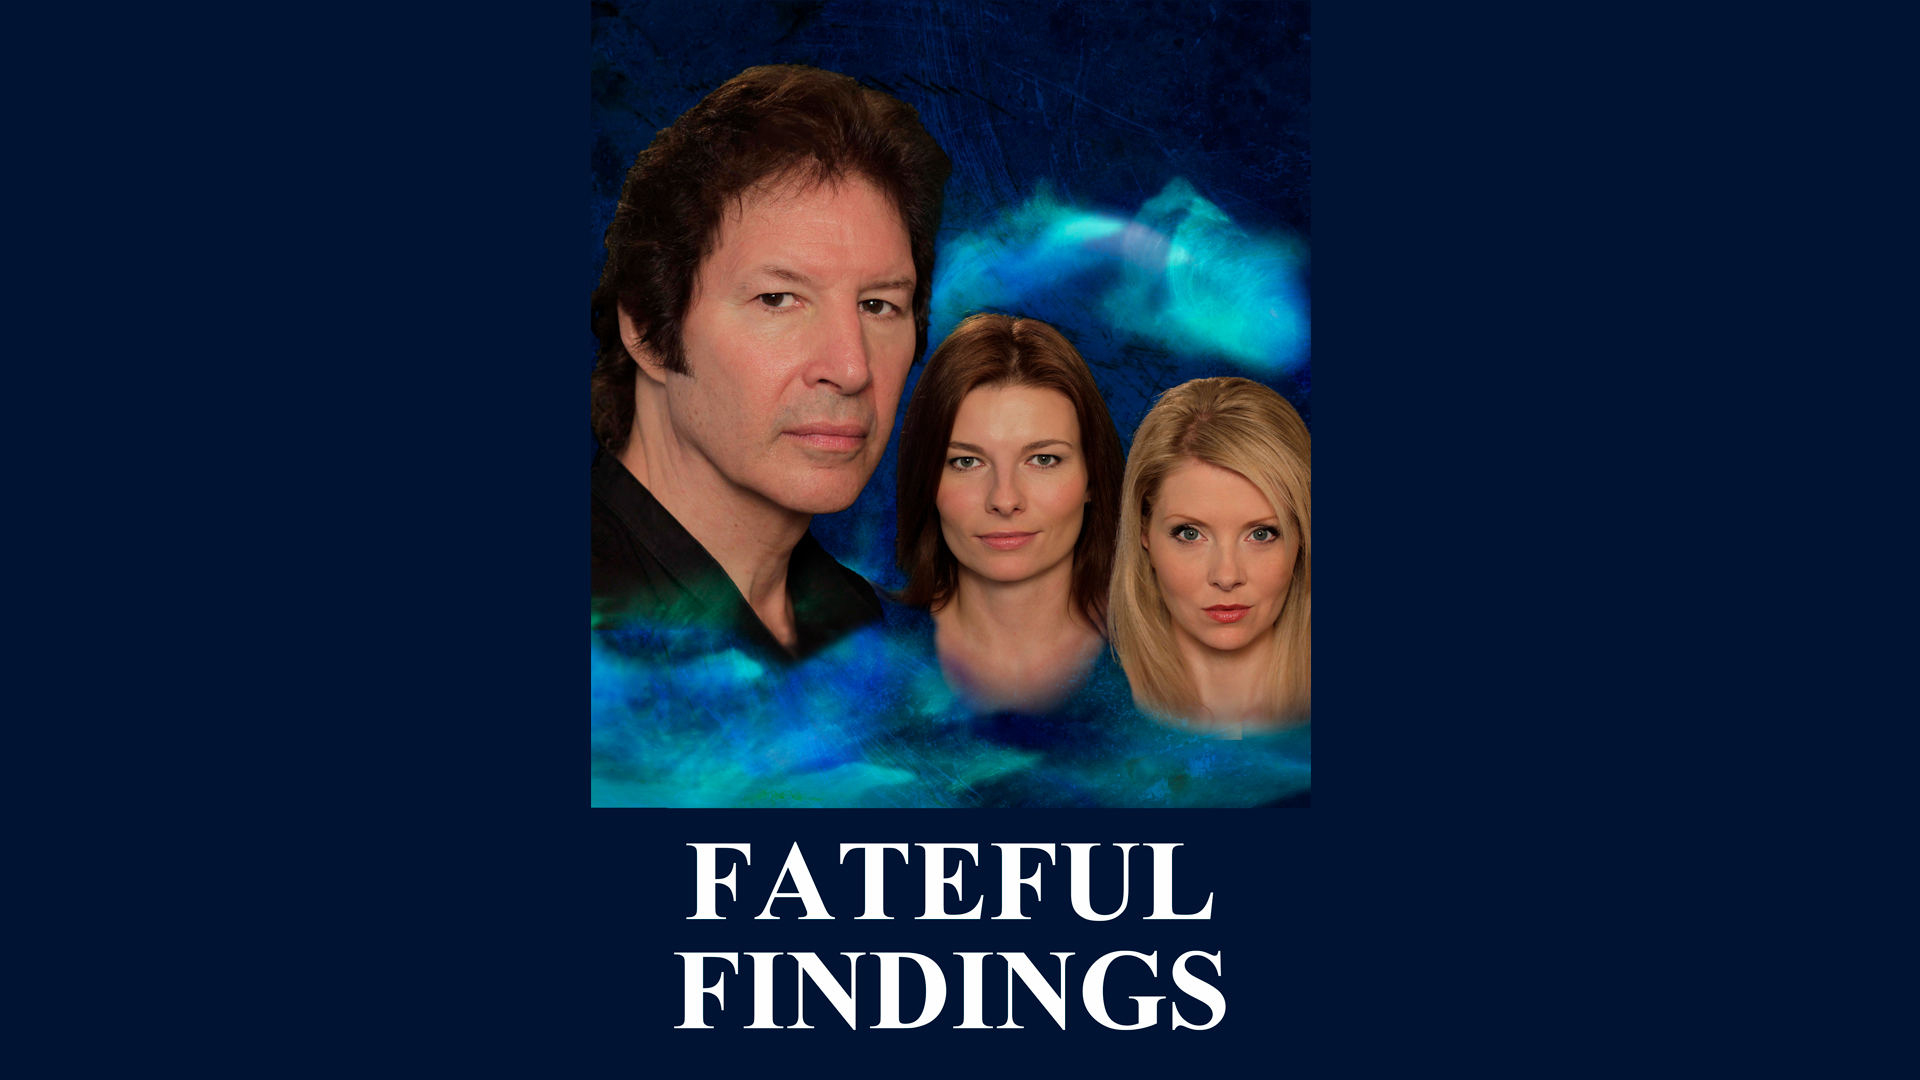 Fateful Findings